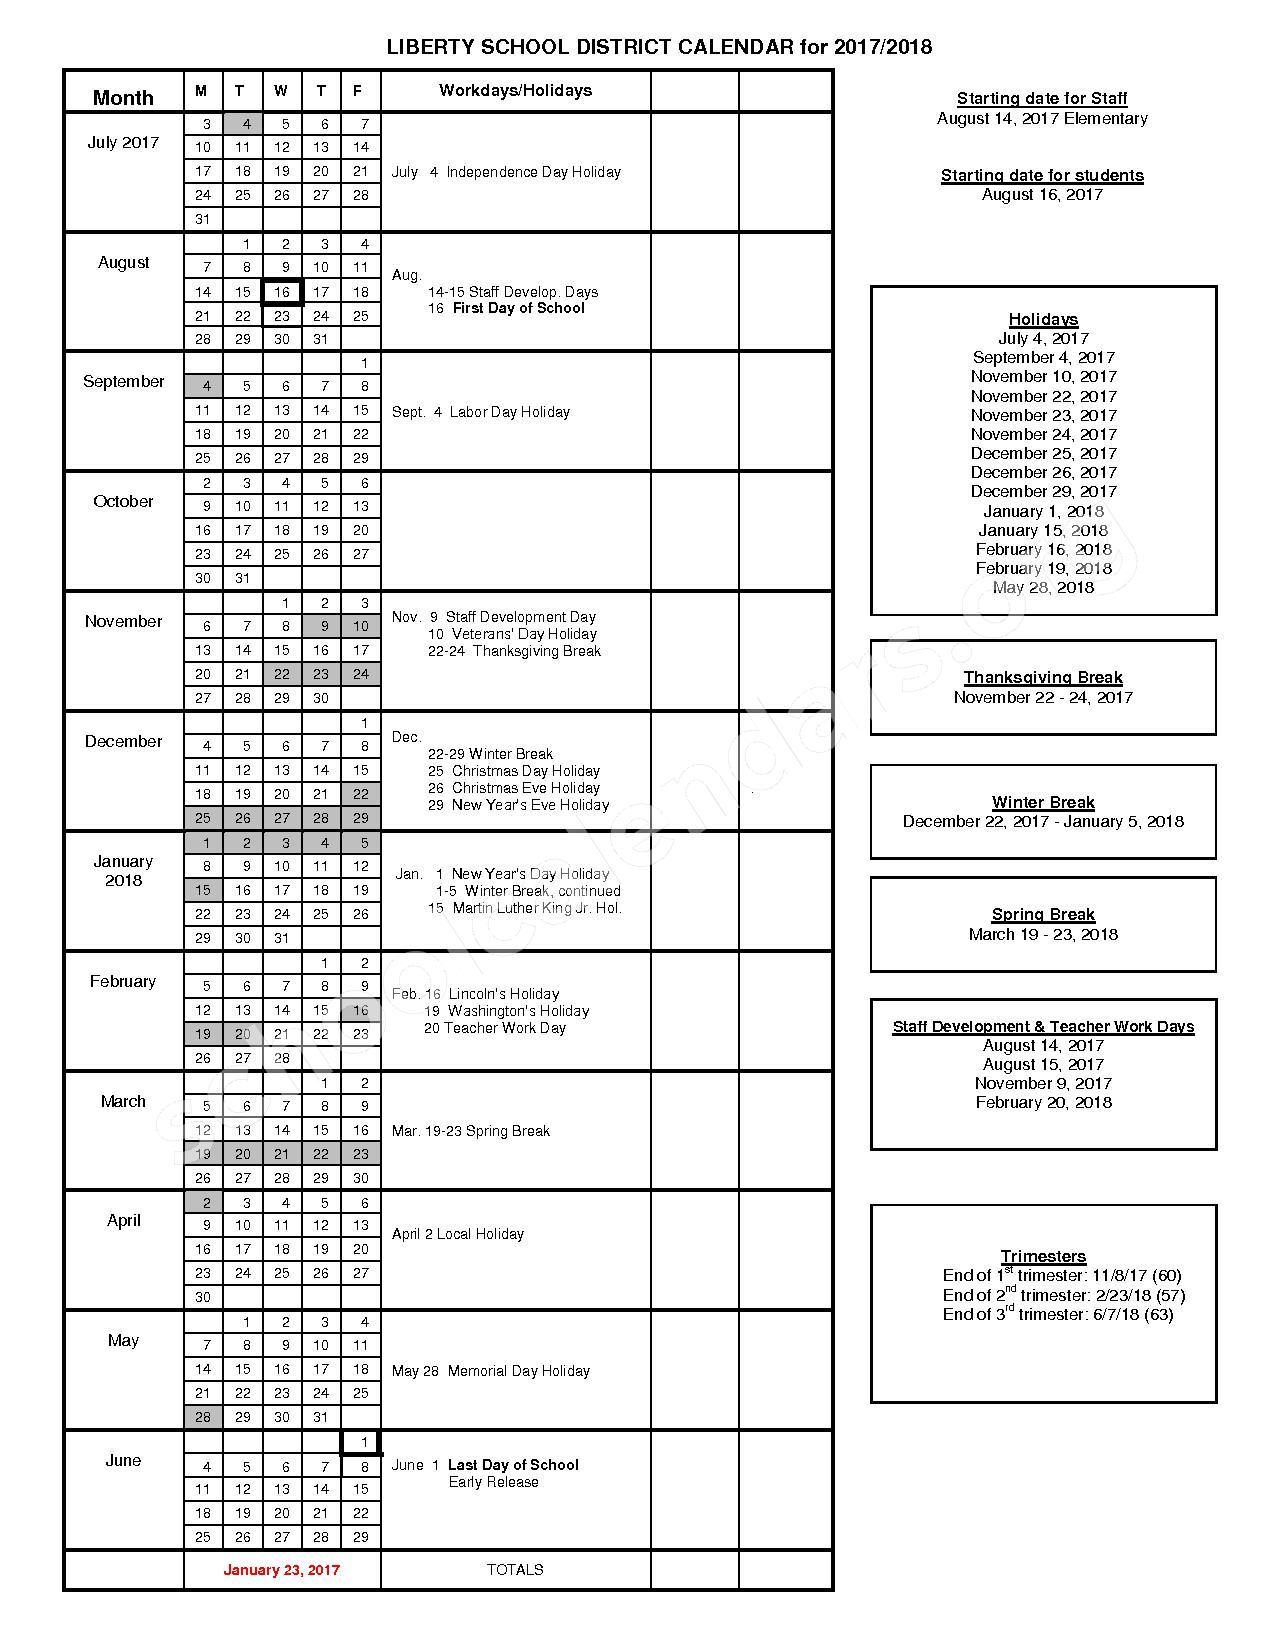 2017 - 2018 School Calendar – Liberty Elementary School District – page 1